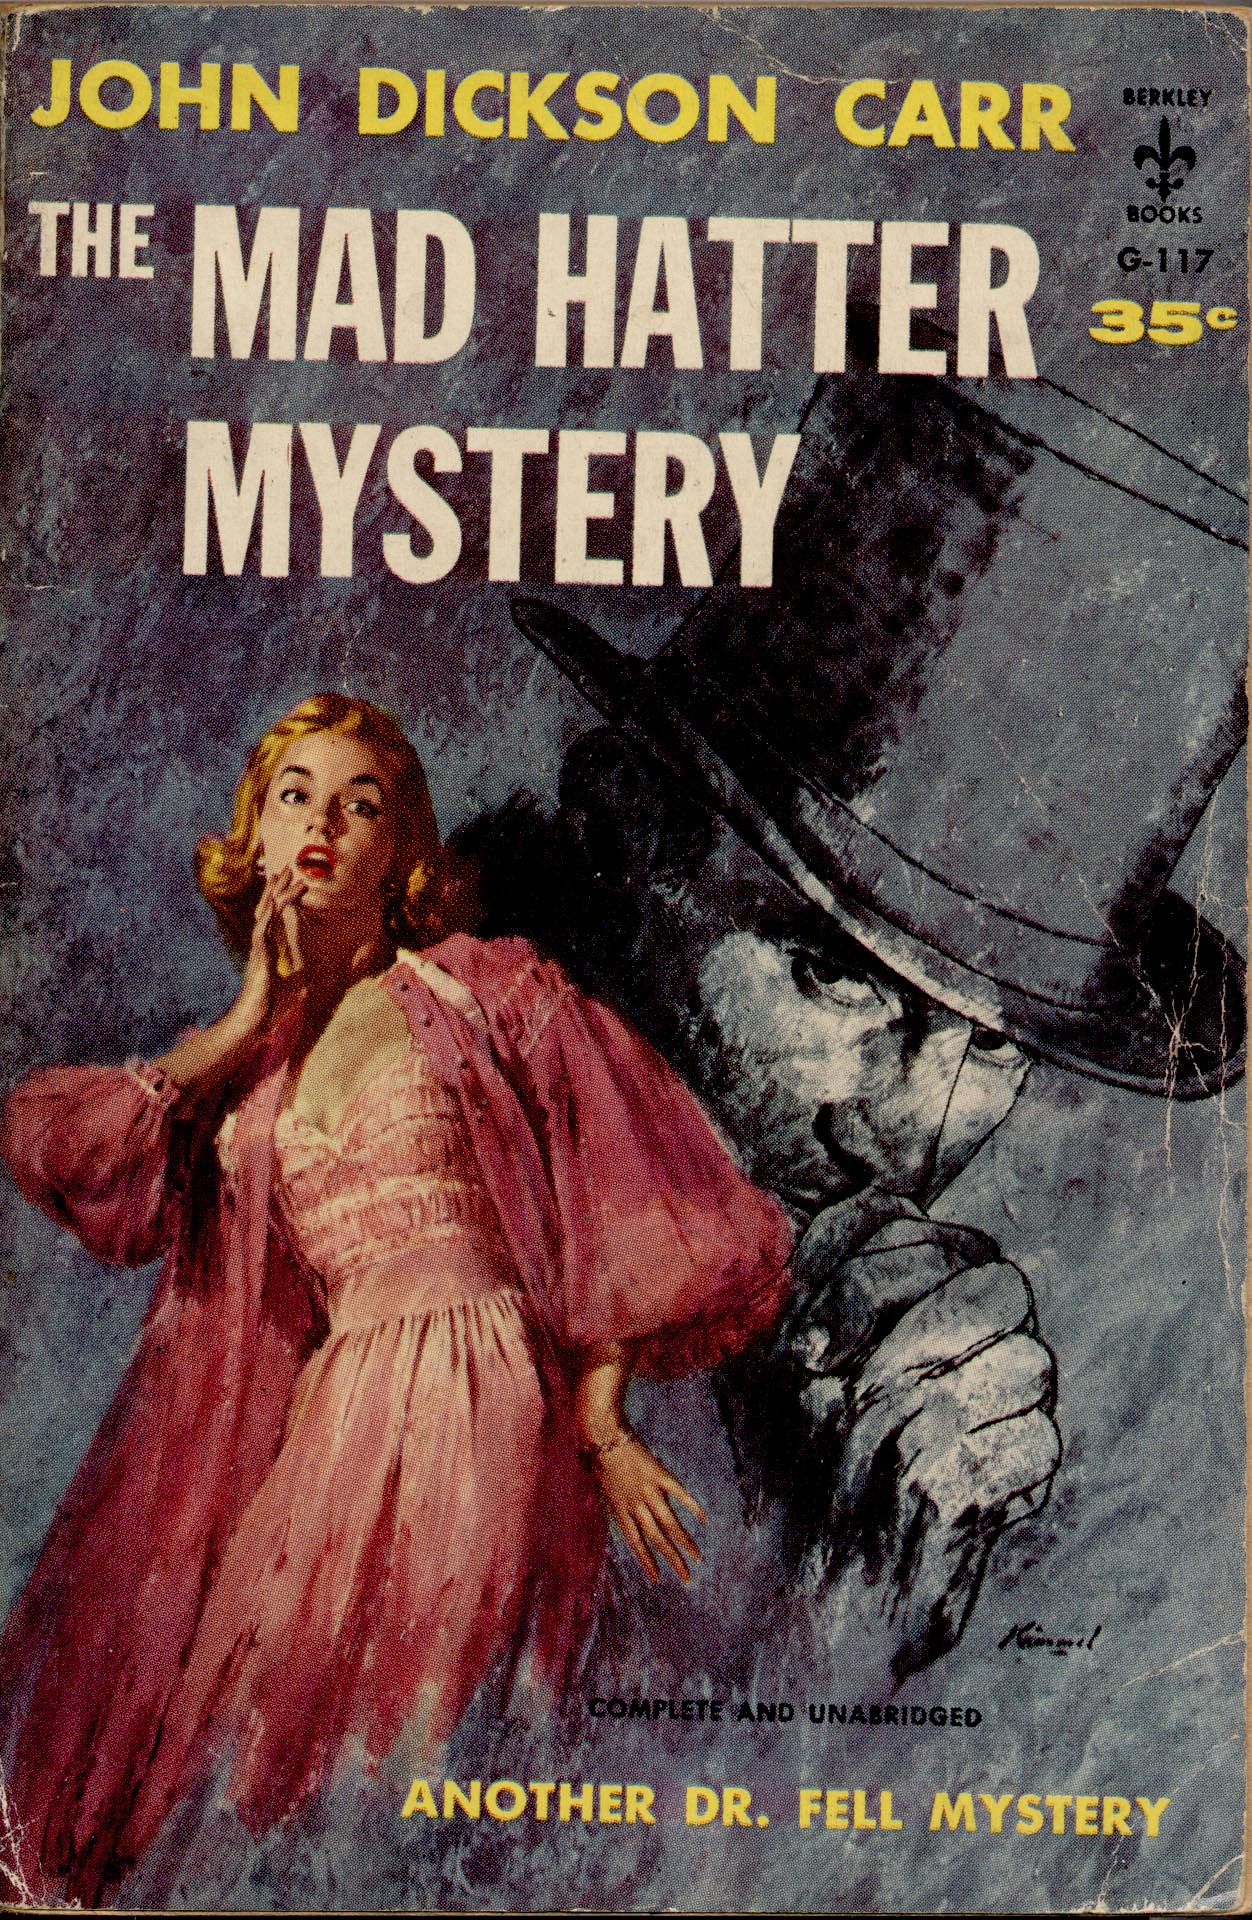 Джон Диксон Карр — Загадка Безумного Шляпника (1933)